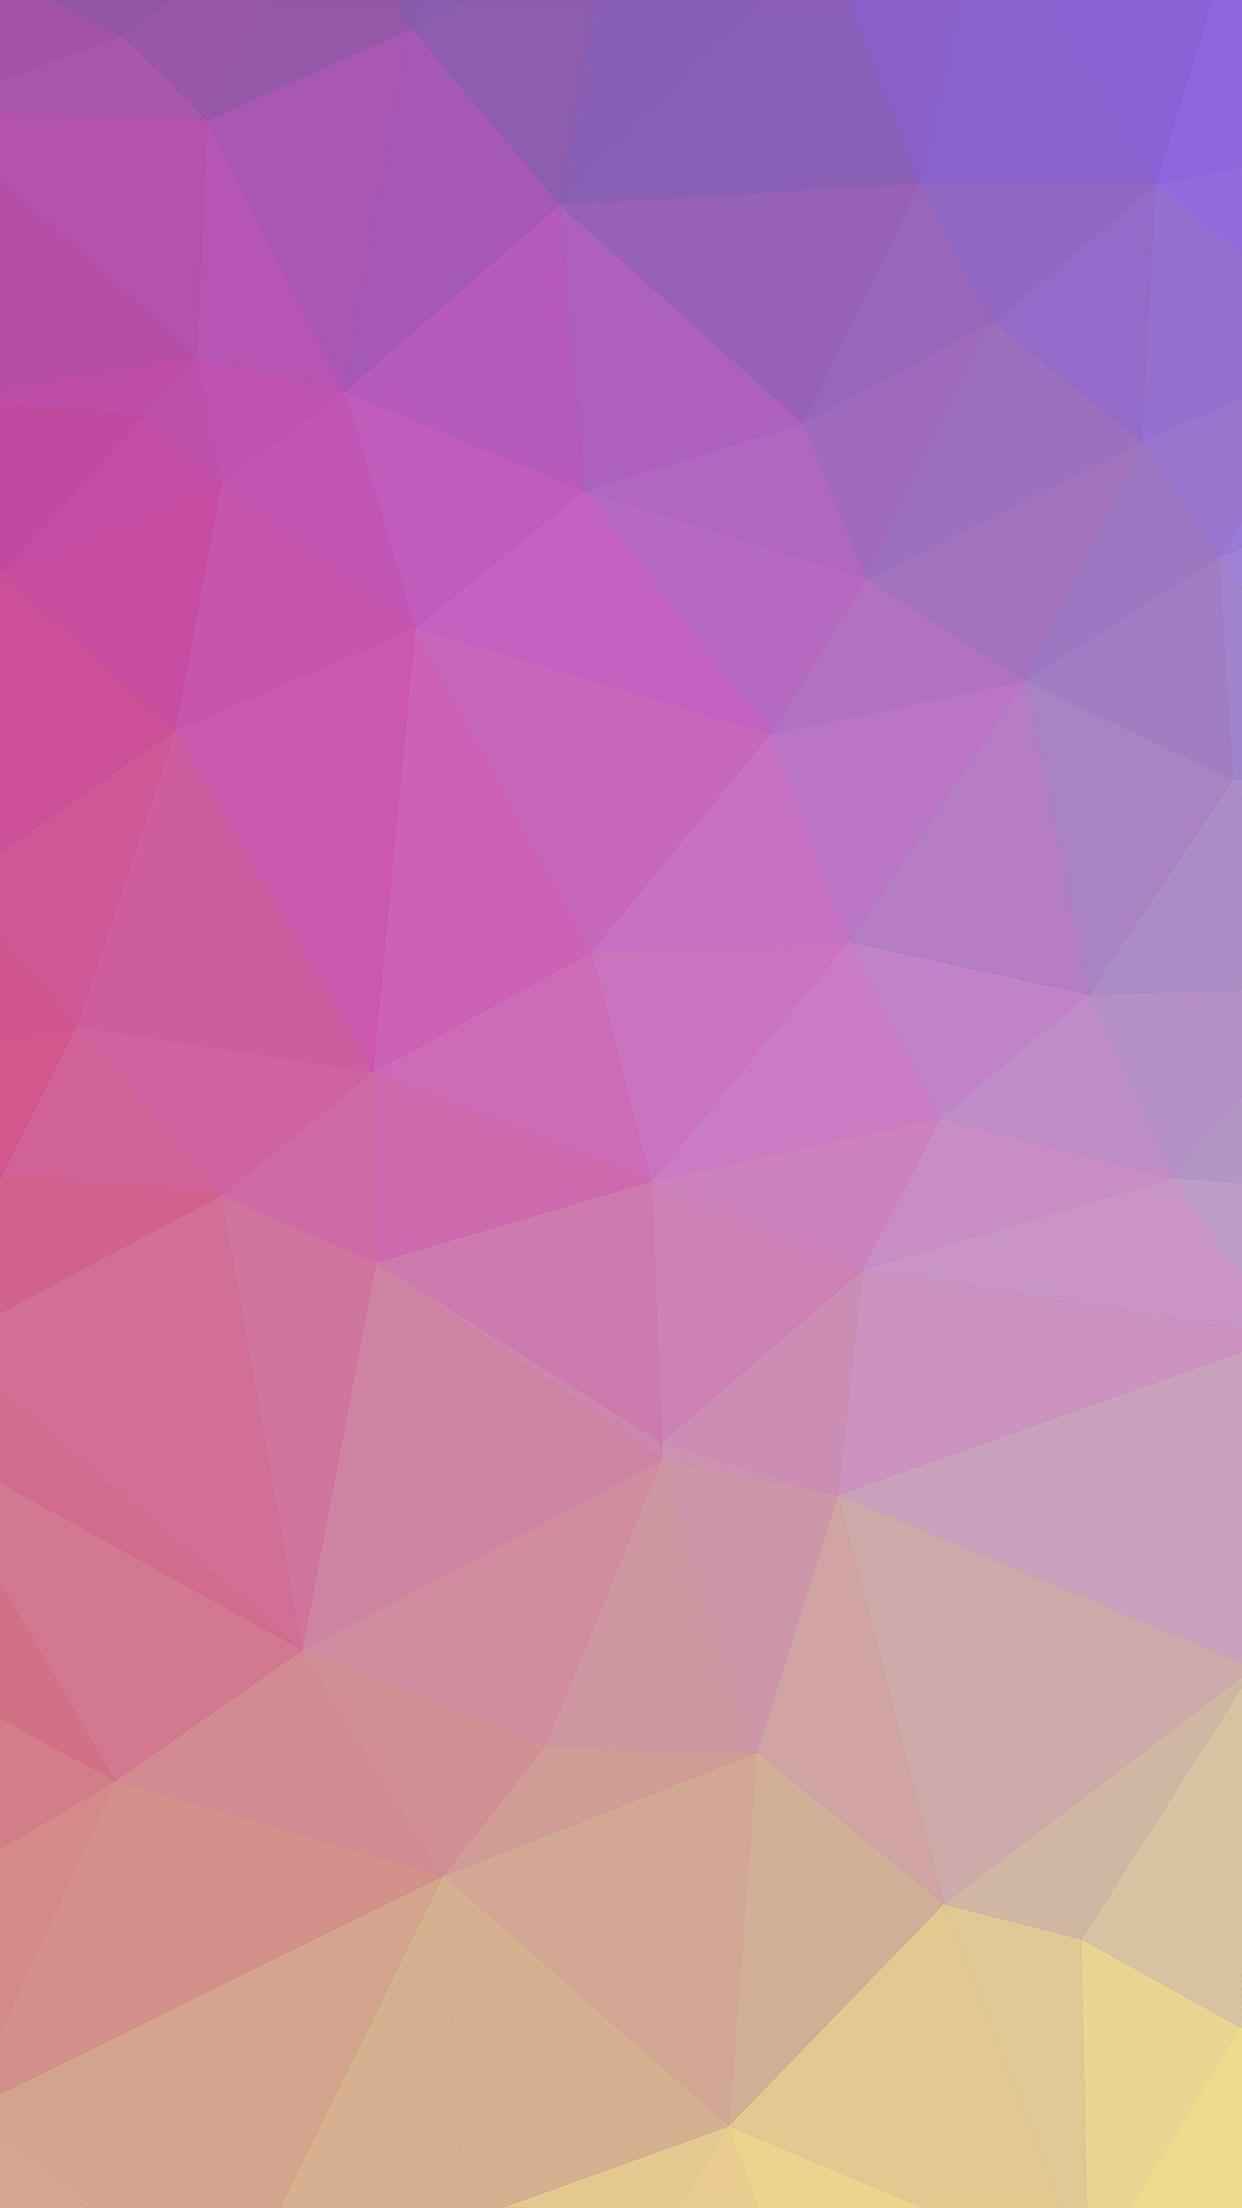 Papers Co Iphone Wallpaper Vk65 Samsung Galaxy Polyart Pastel Pink Yellow Pattern